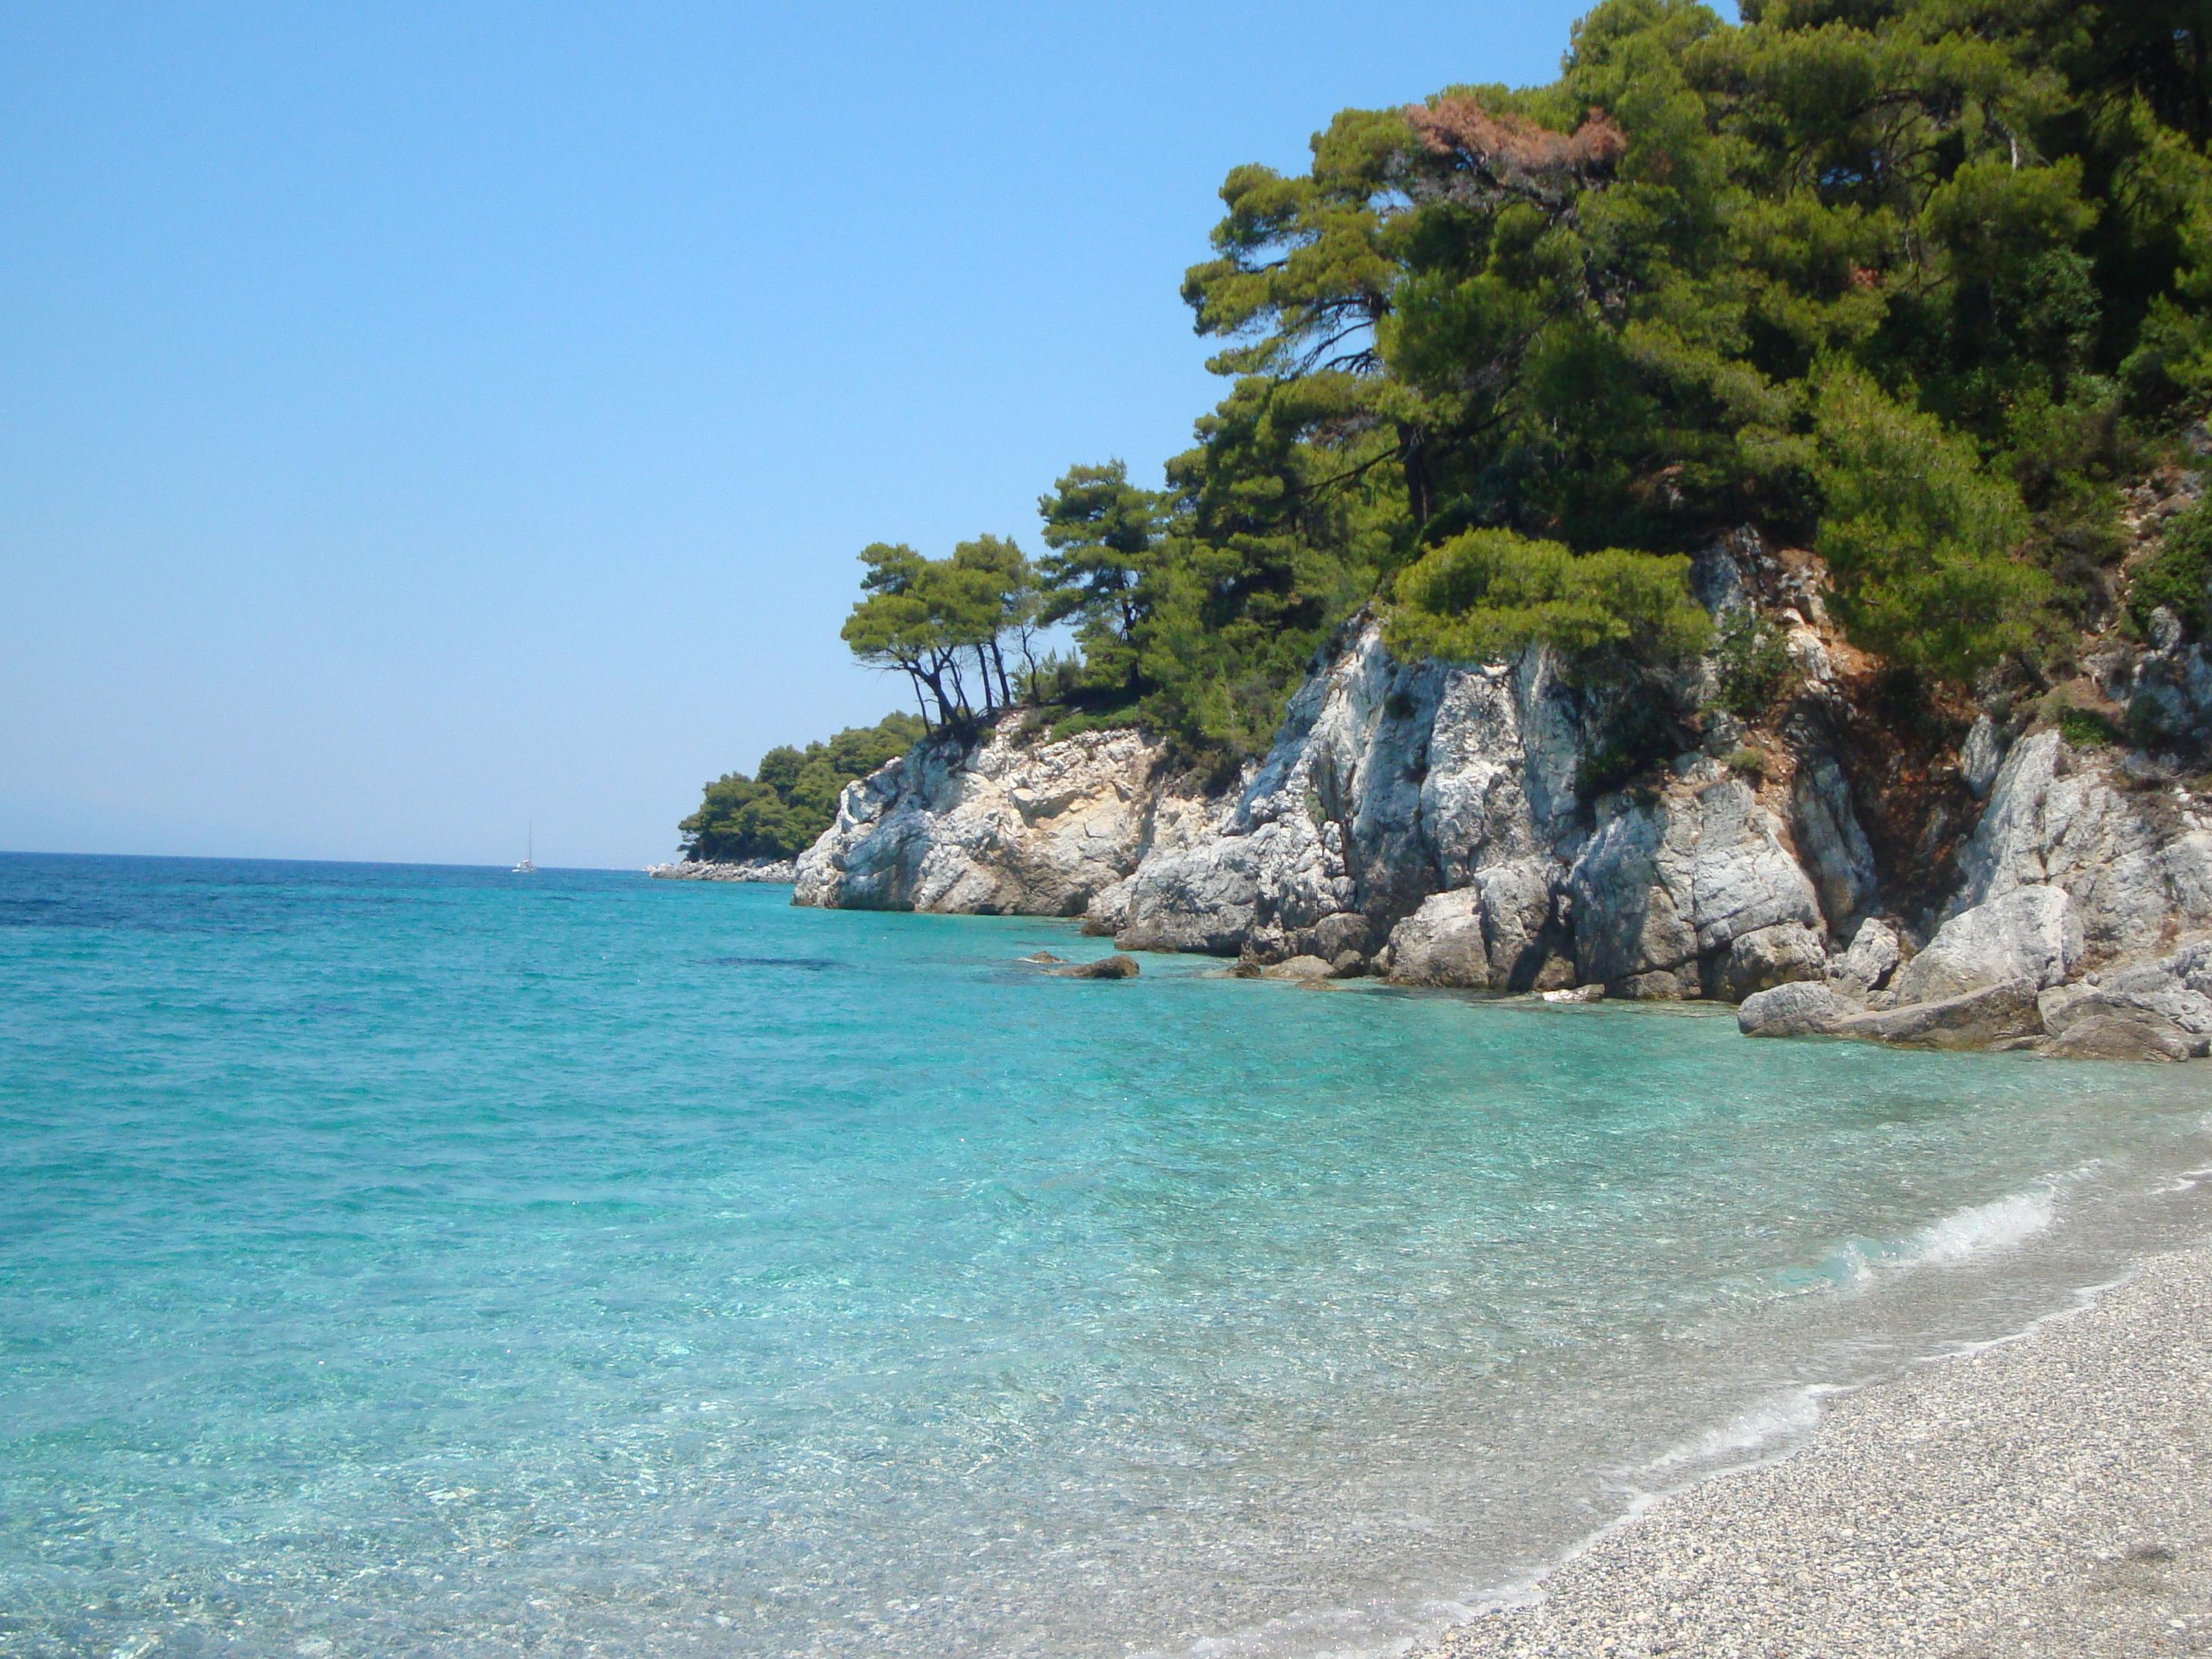 22. Пляж Кастани (Καστάνη) -